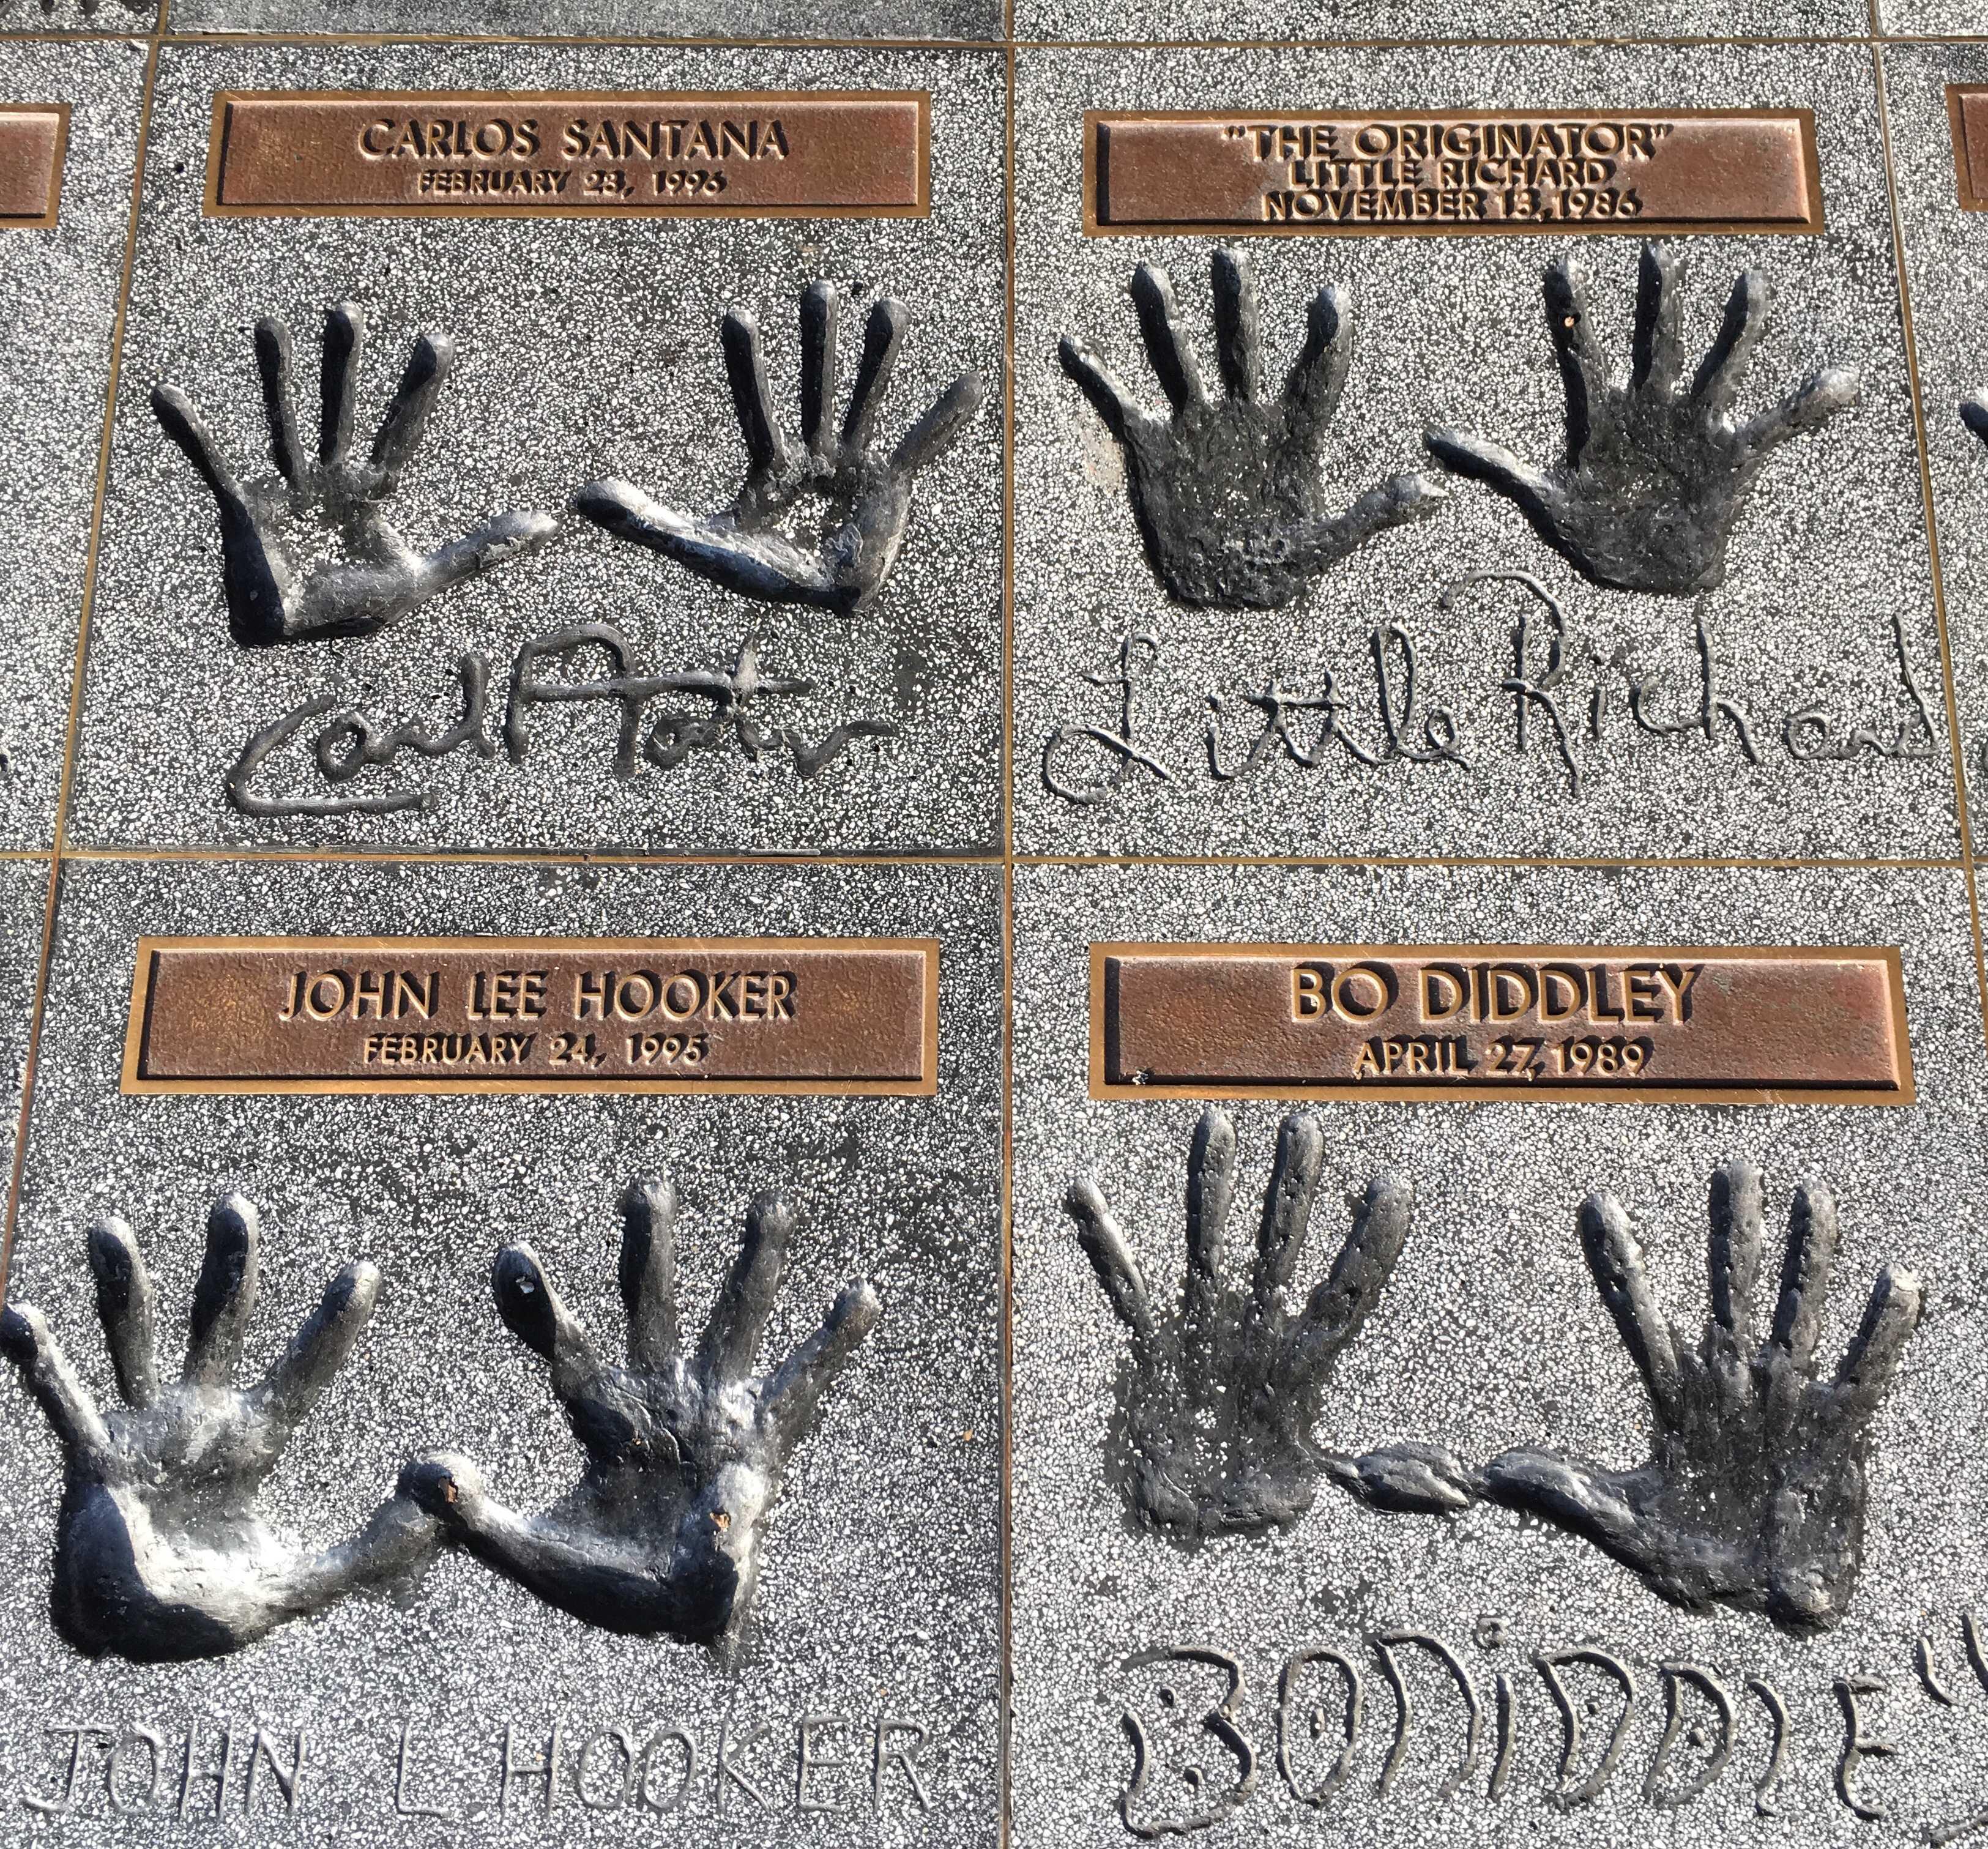 4 Hand Prints in Concrete